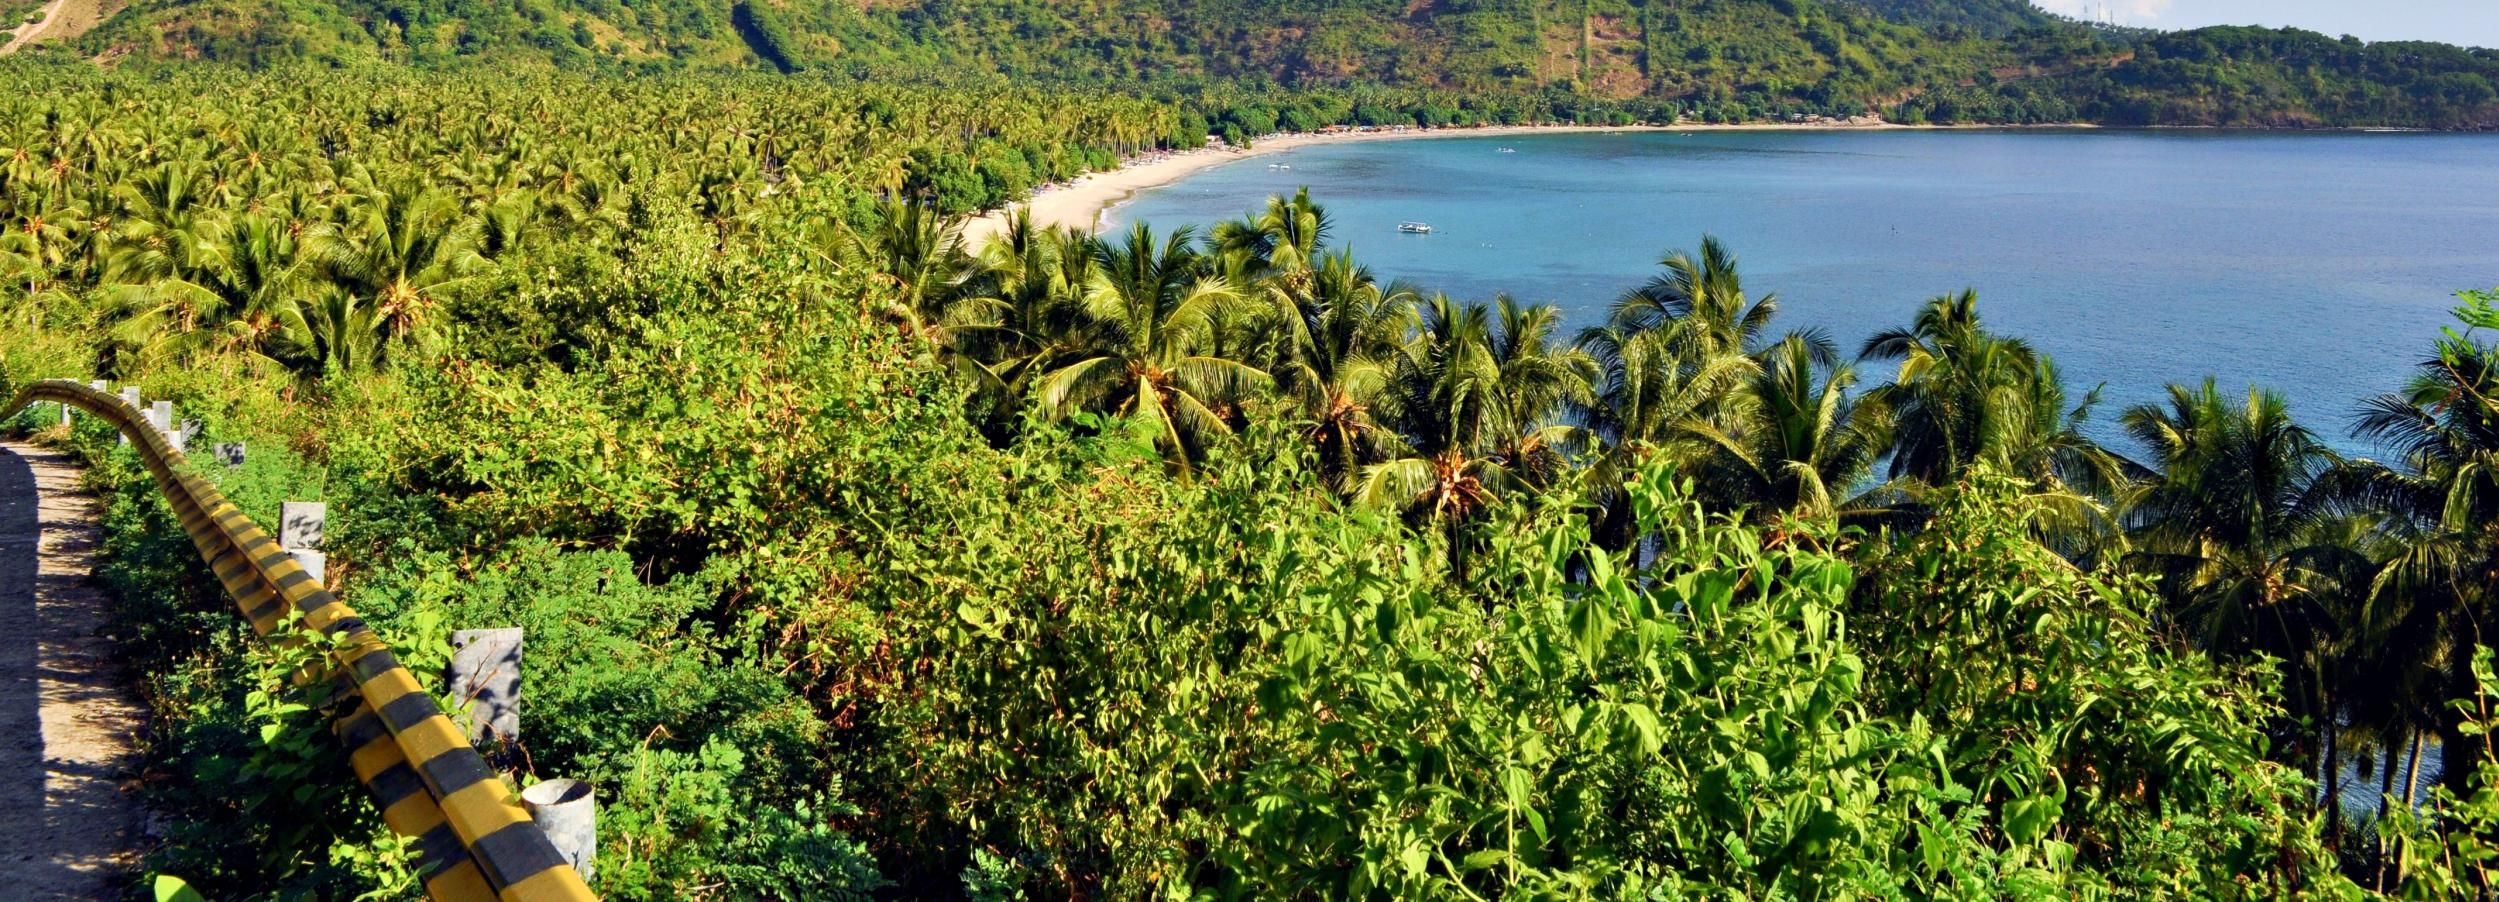 Lombok-Tour: Tempel, Malimbu-Hügel und Affenwald im Abendrot